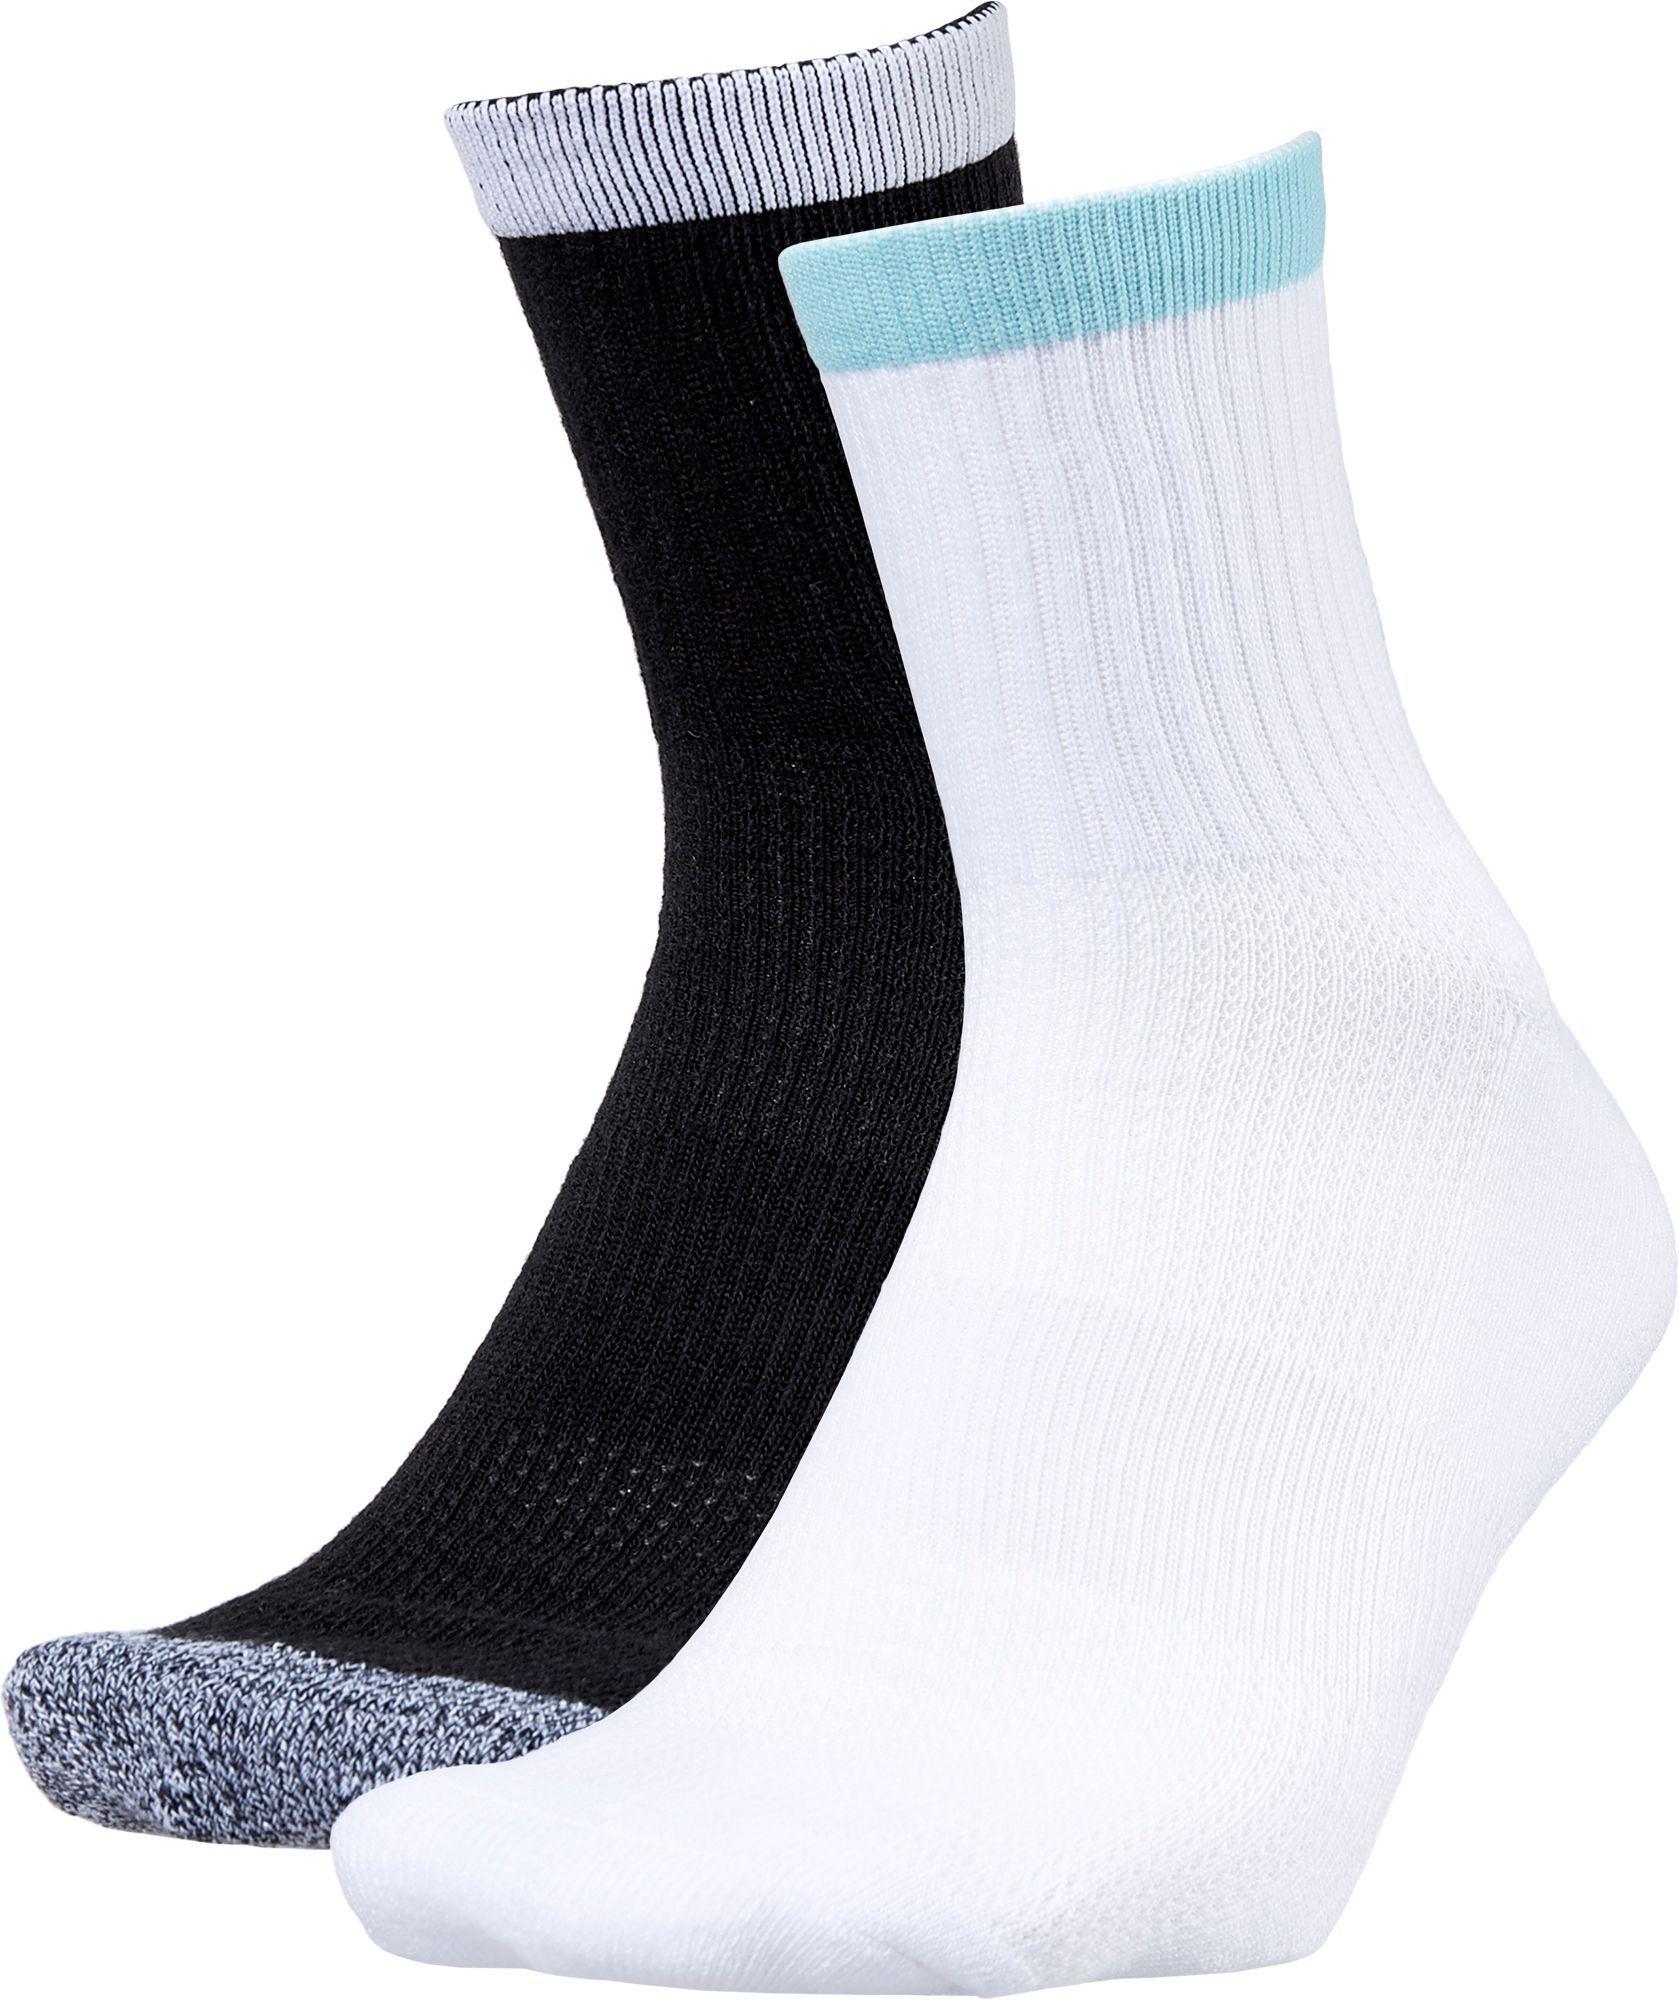 Prince Men S Half Crew Tennis Socks 2 Pack Size Large Blue Tennis Socks Socks Men